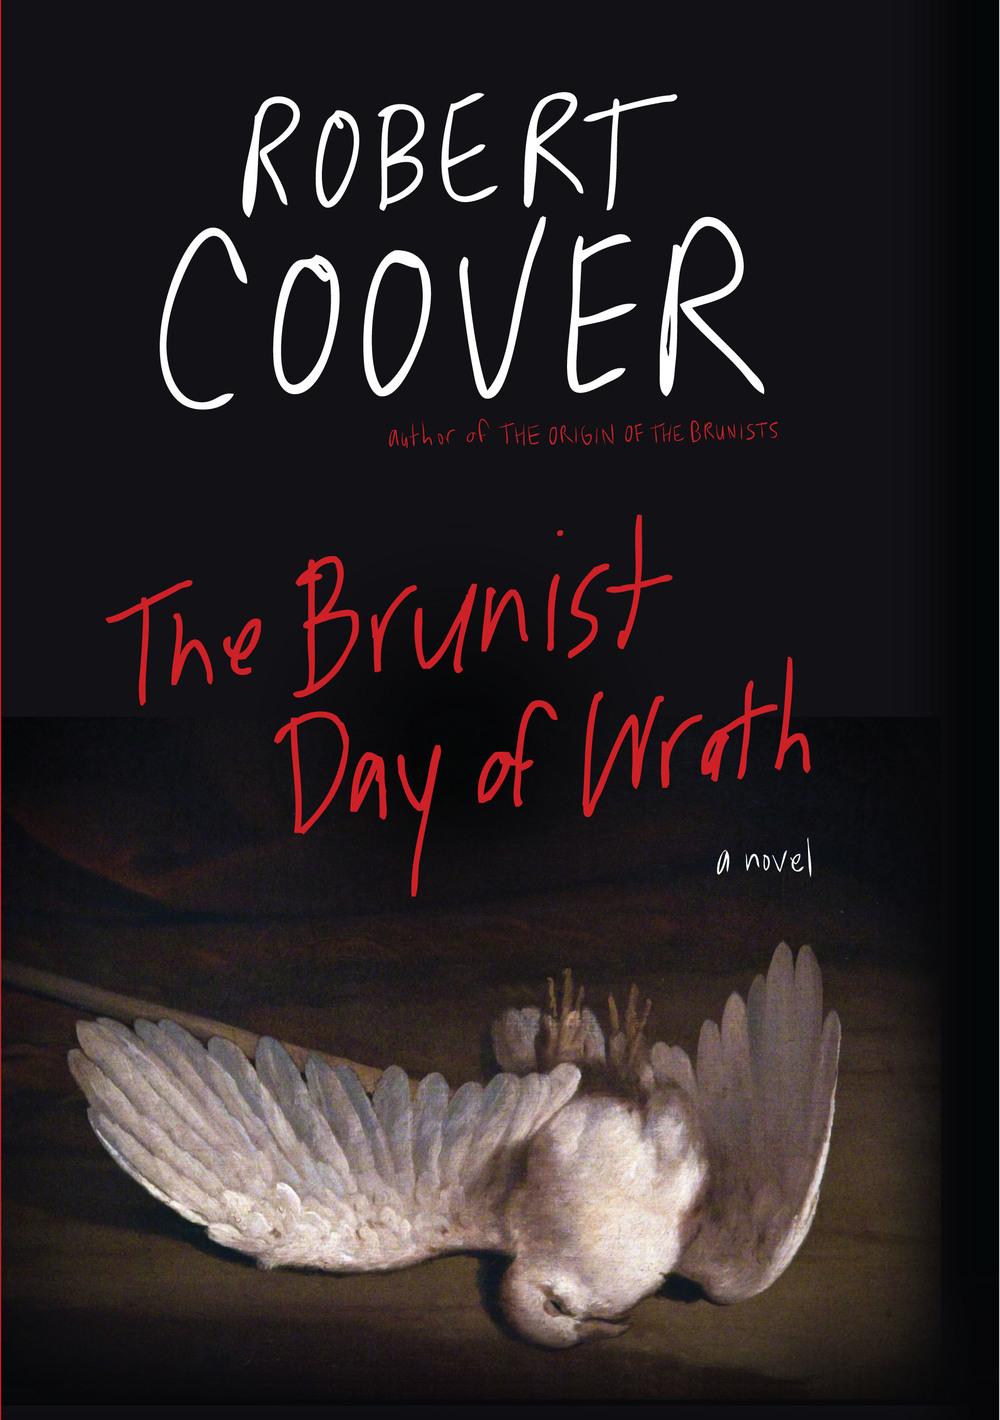 Brunist Day of Wrath_Robert Coover.jpg